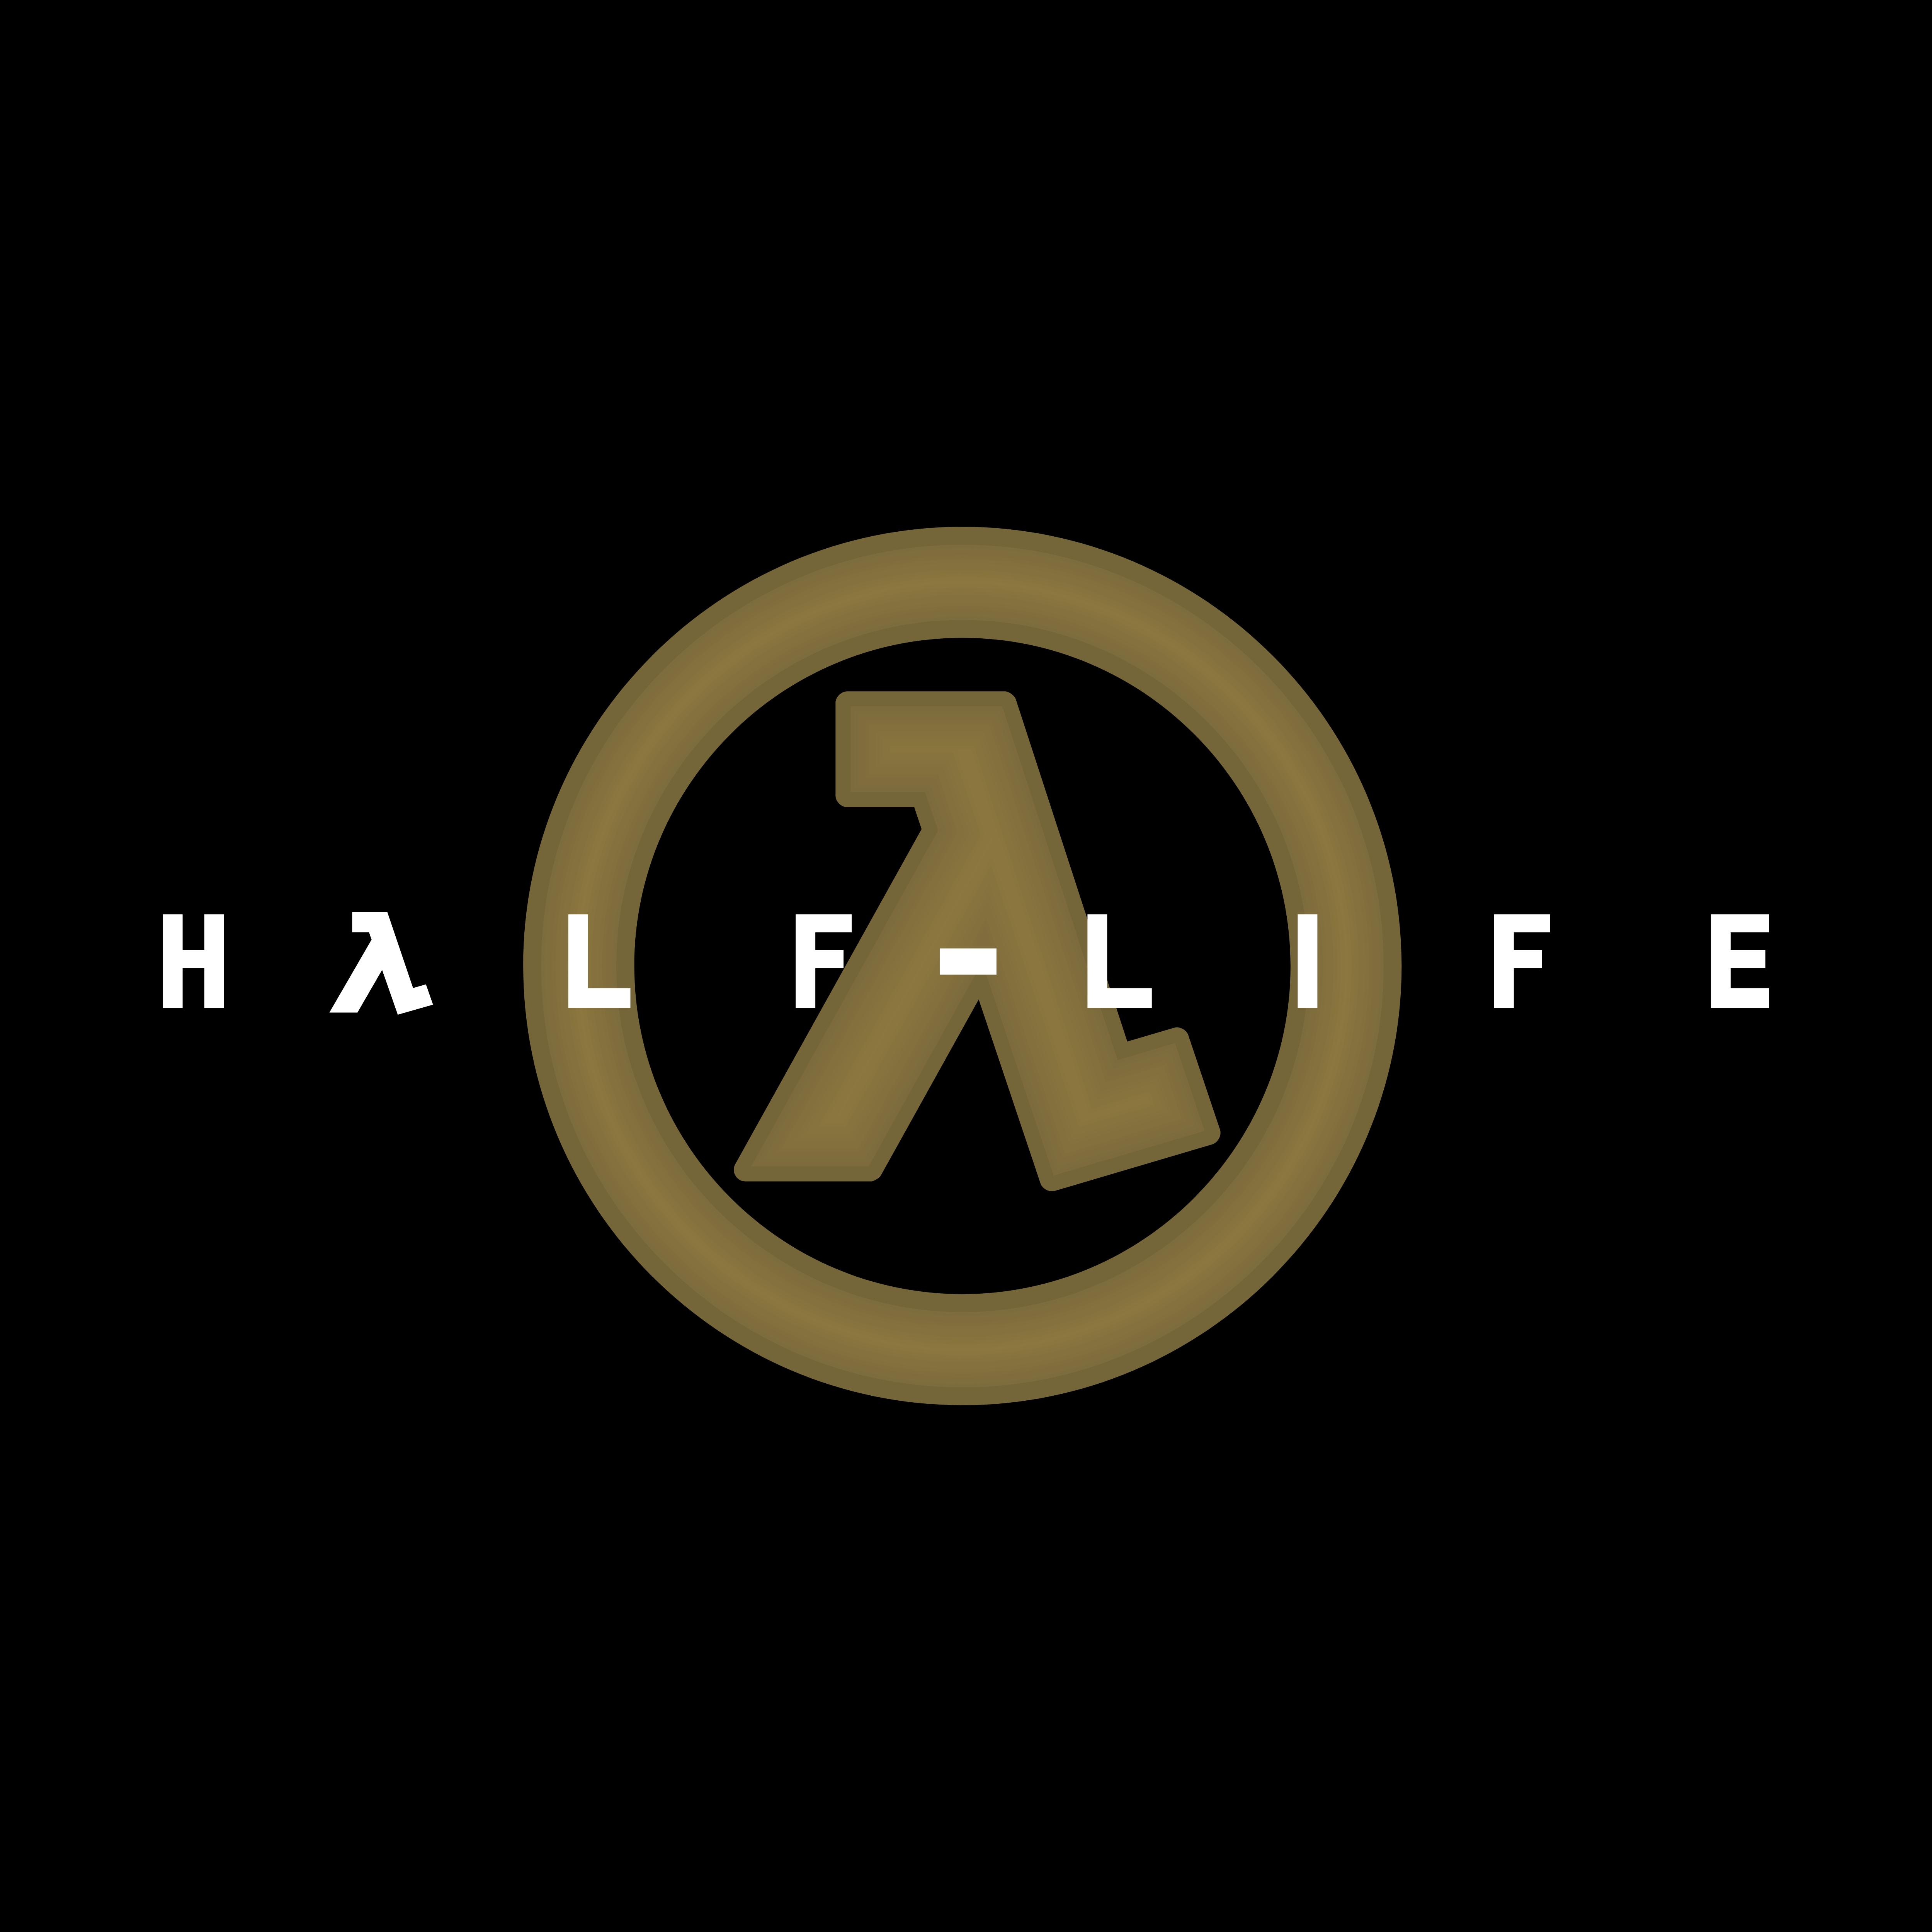 Half Life Logos Download